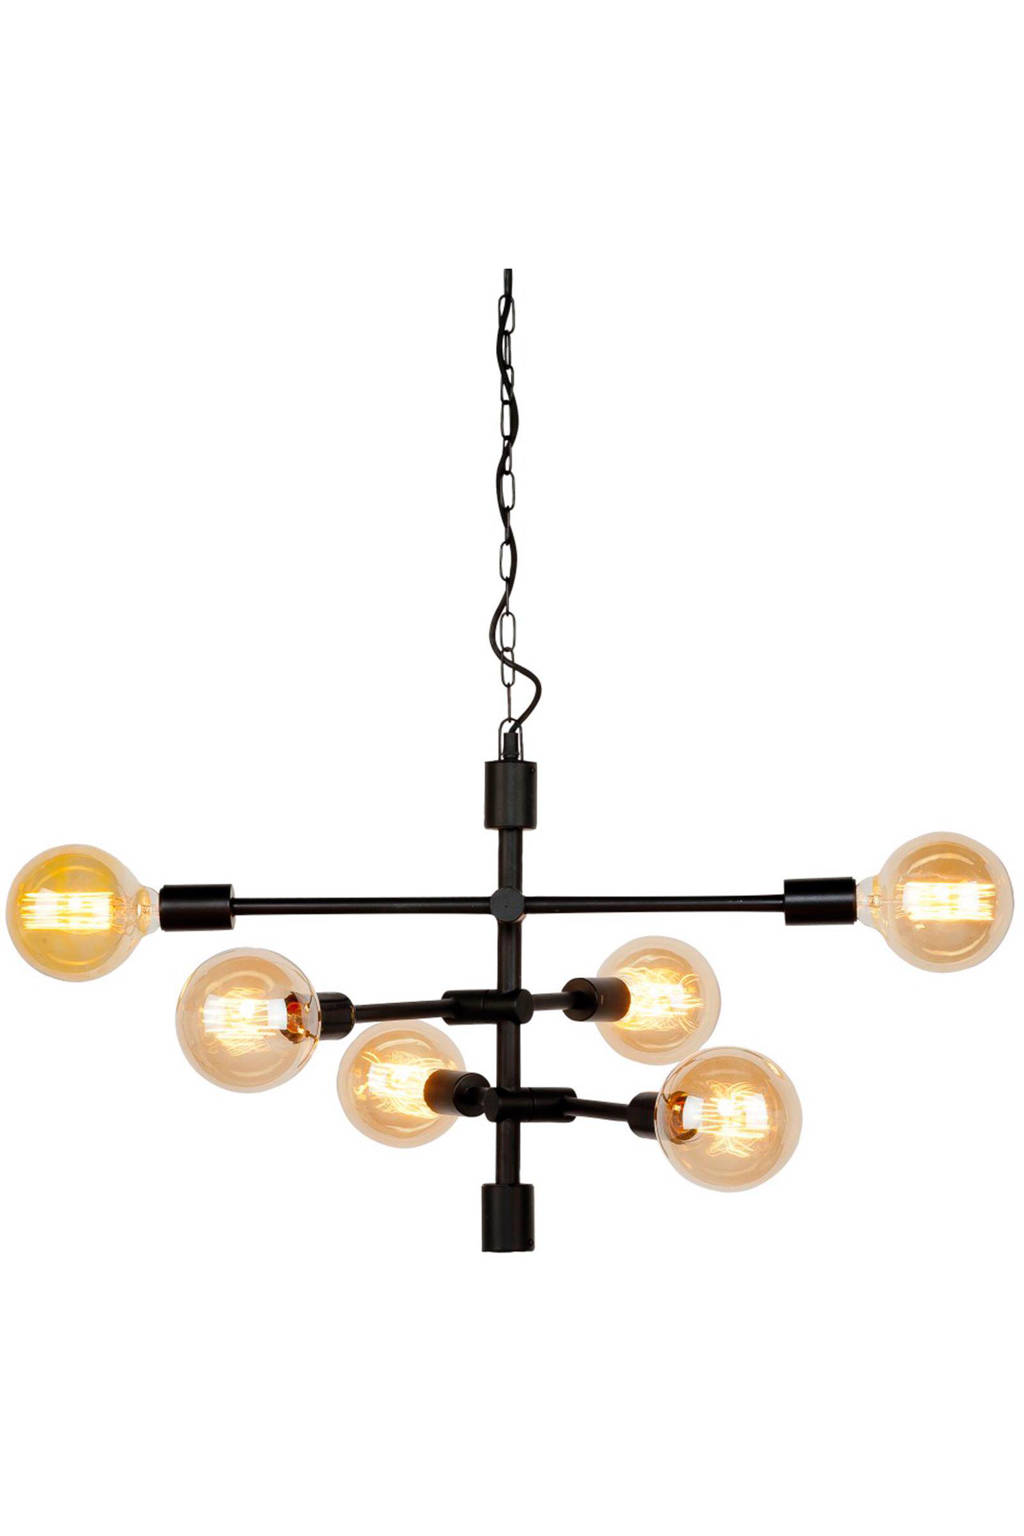 It's about RoMi hanglamp Nashville, Zwart